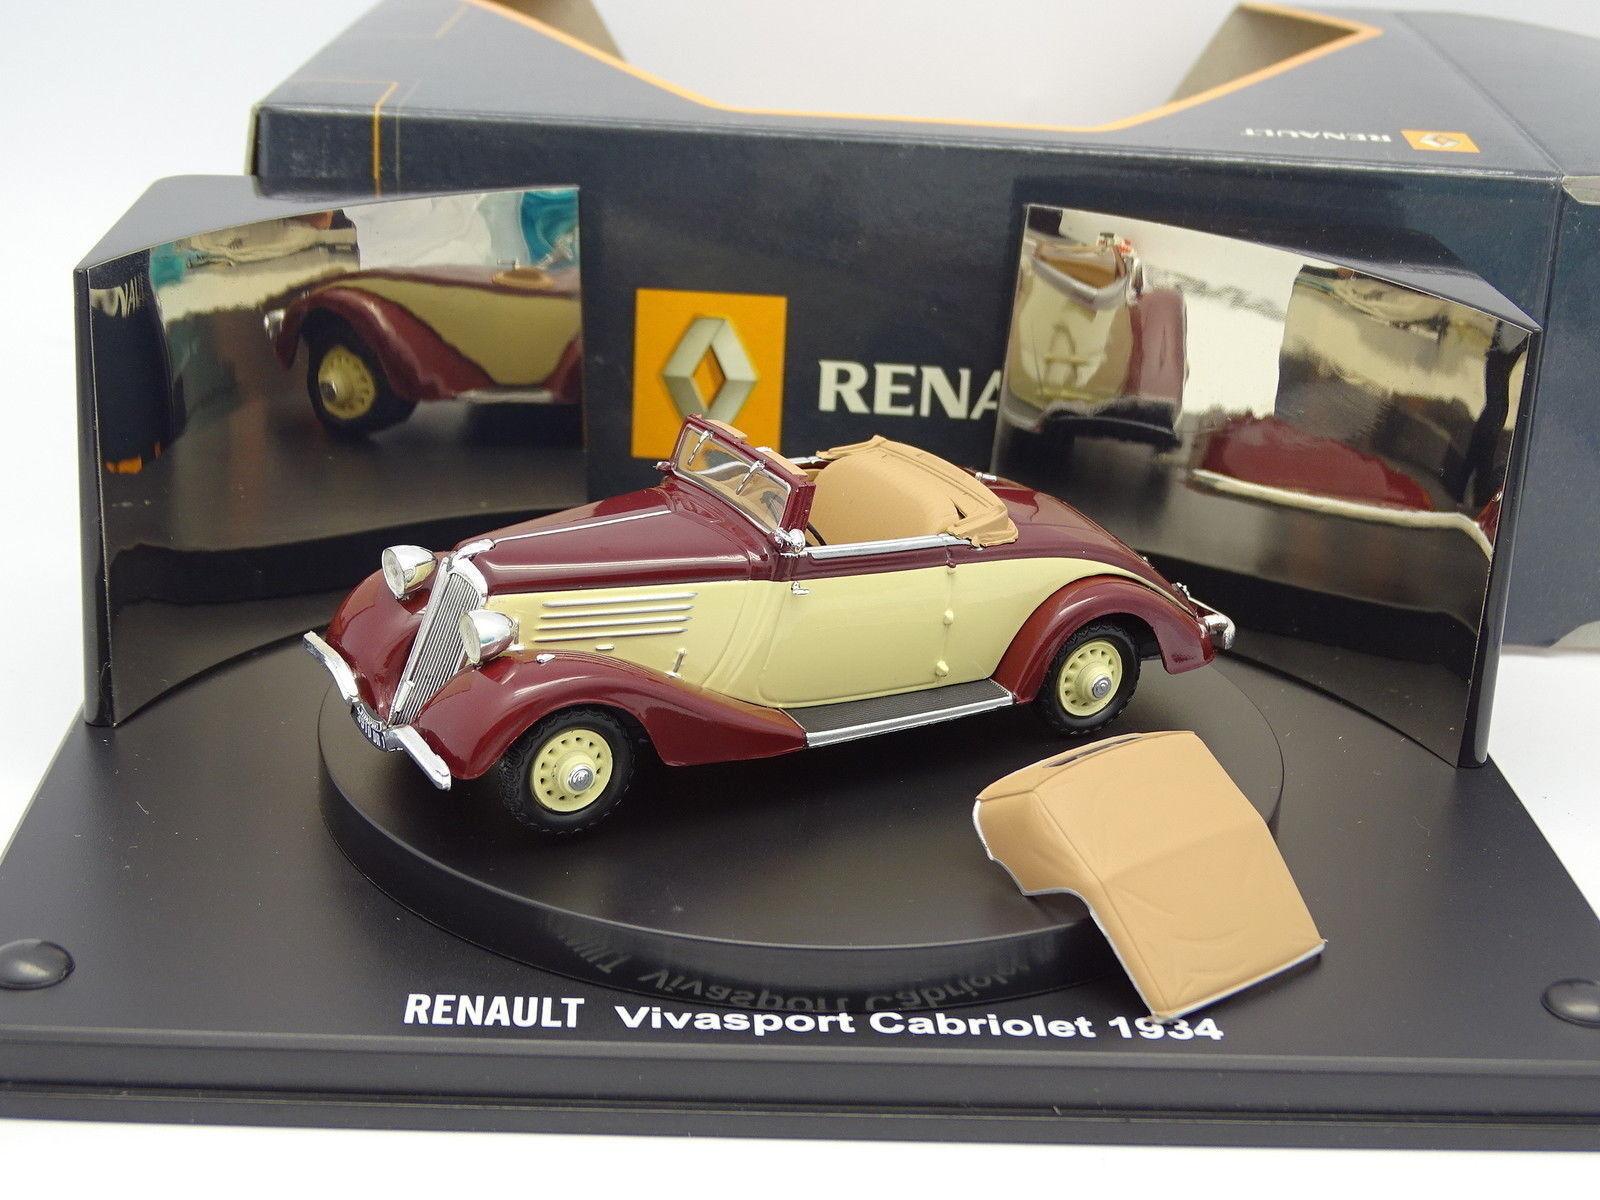 Norev 1 43 - Renault Vivasport Cabriolet 1934